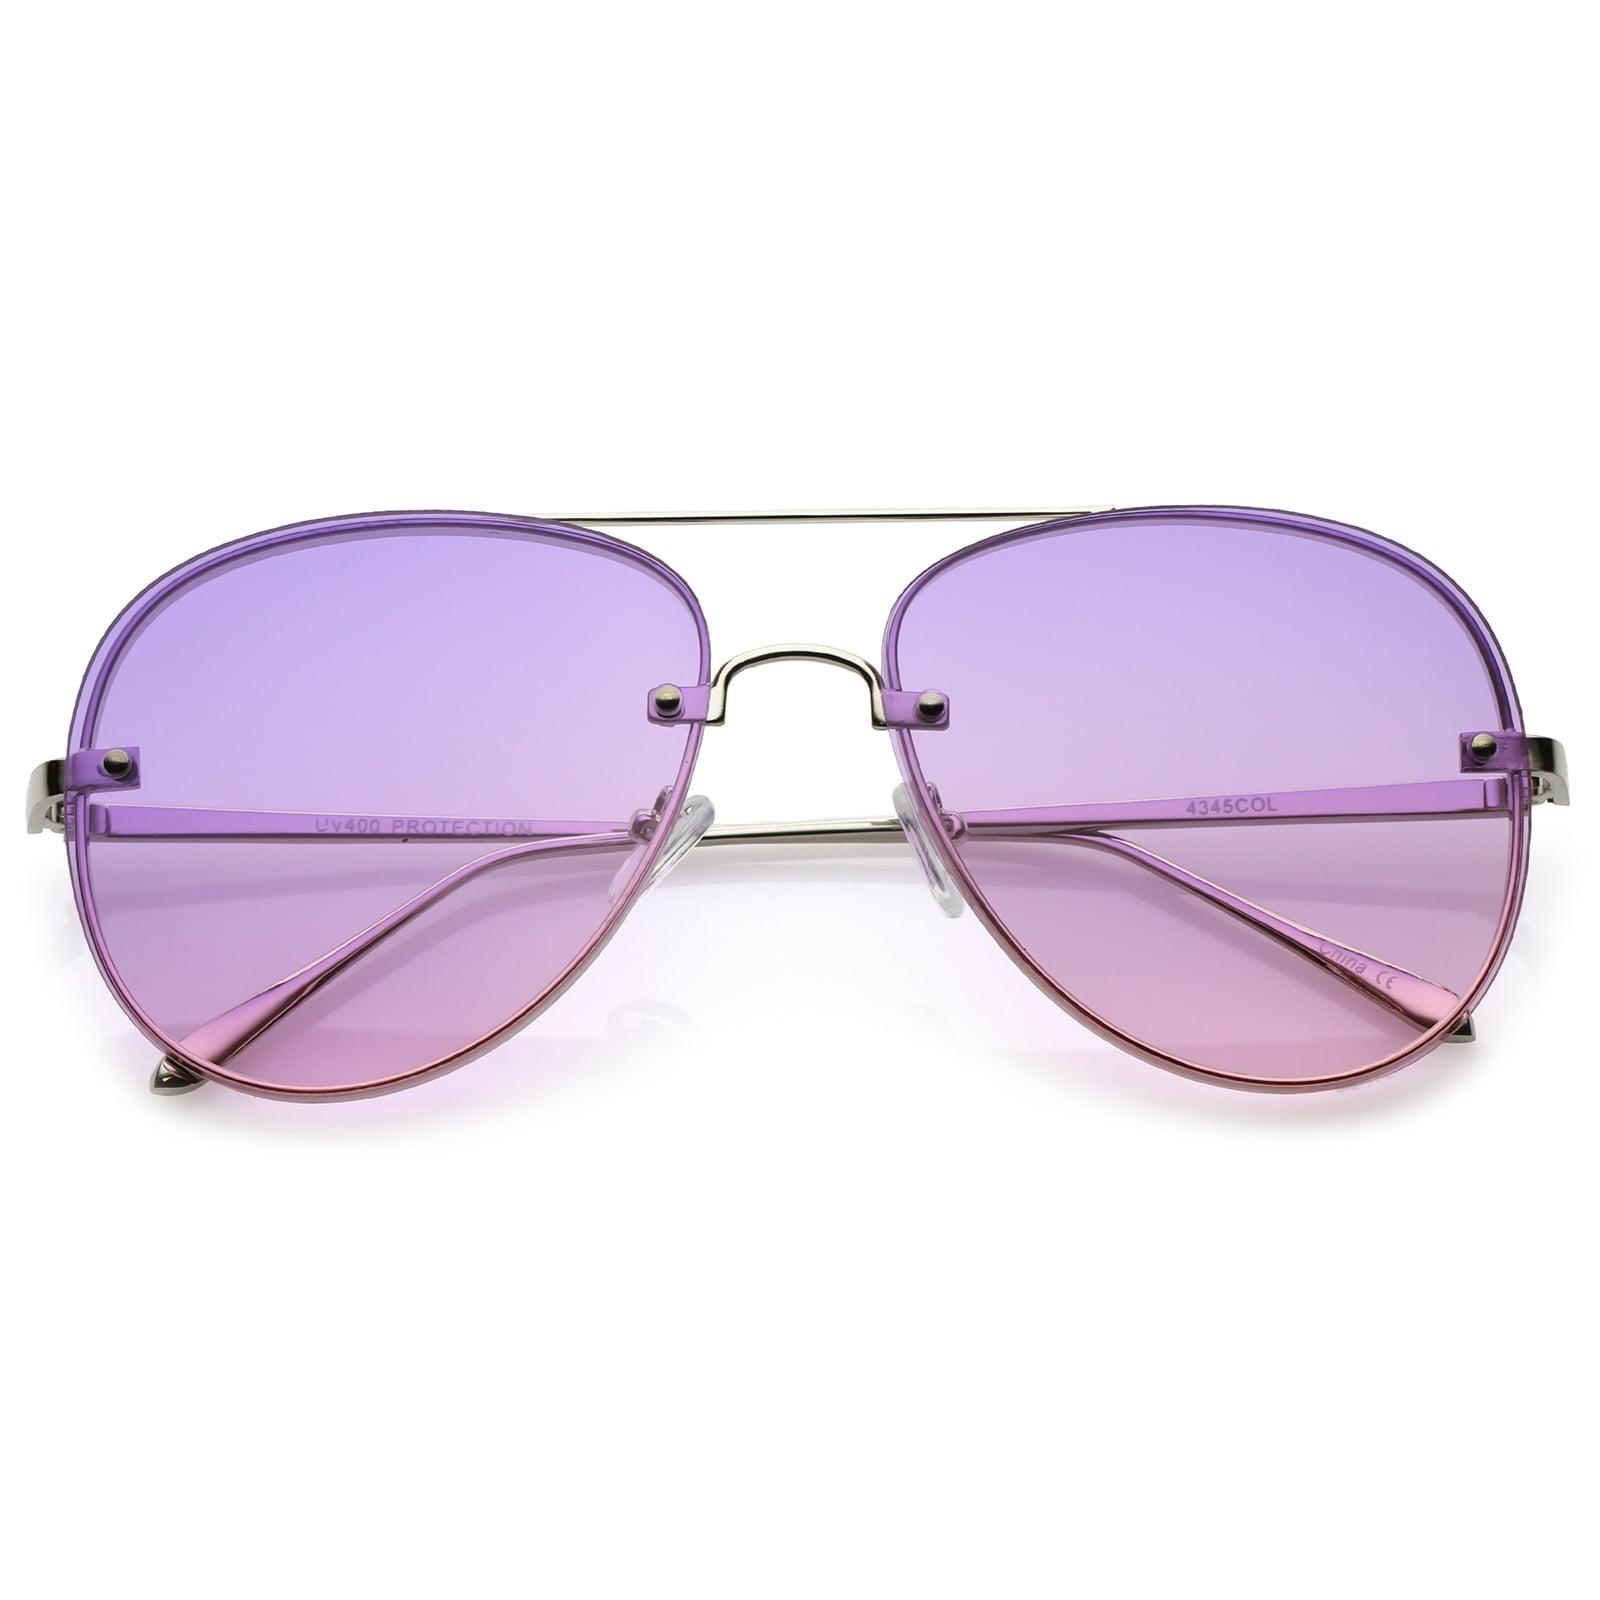 967860dc33 sunglass.la - Oversize Rimless Aviator Sunglasses Thick Frame Gradient Flat  Lens 60mm (Silver   Blue Yellow) - Walmart.com